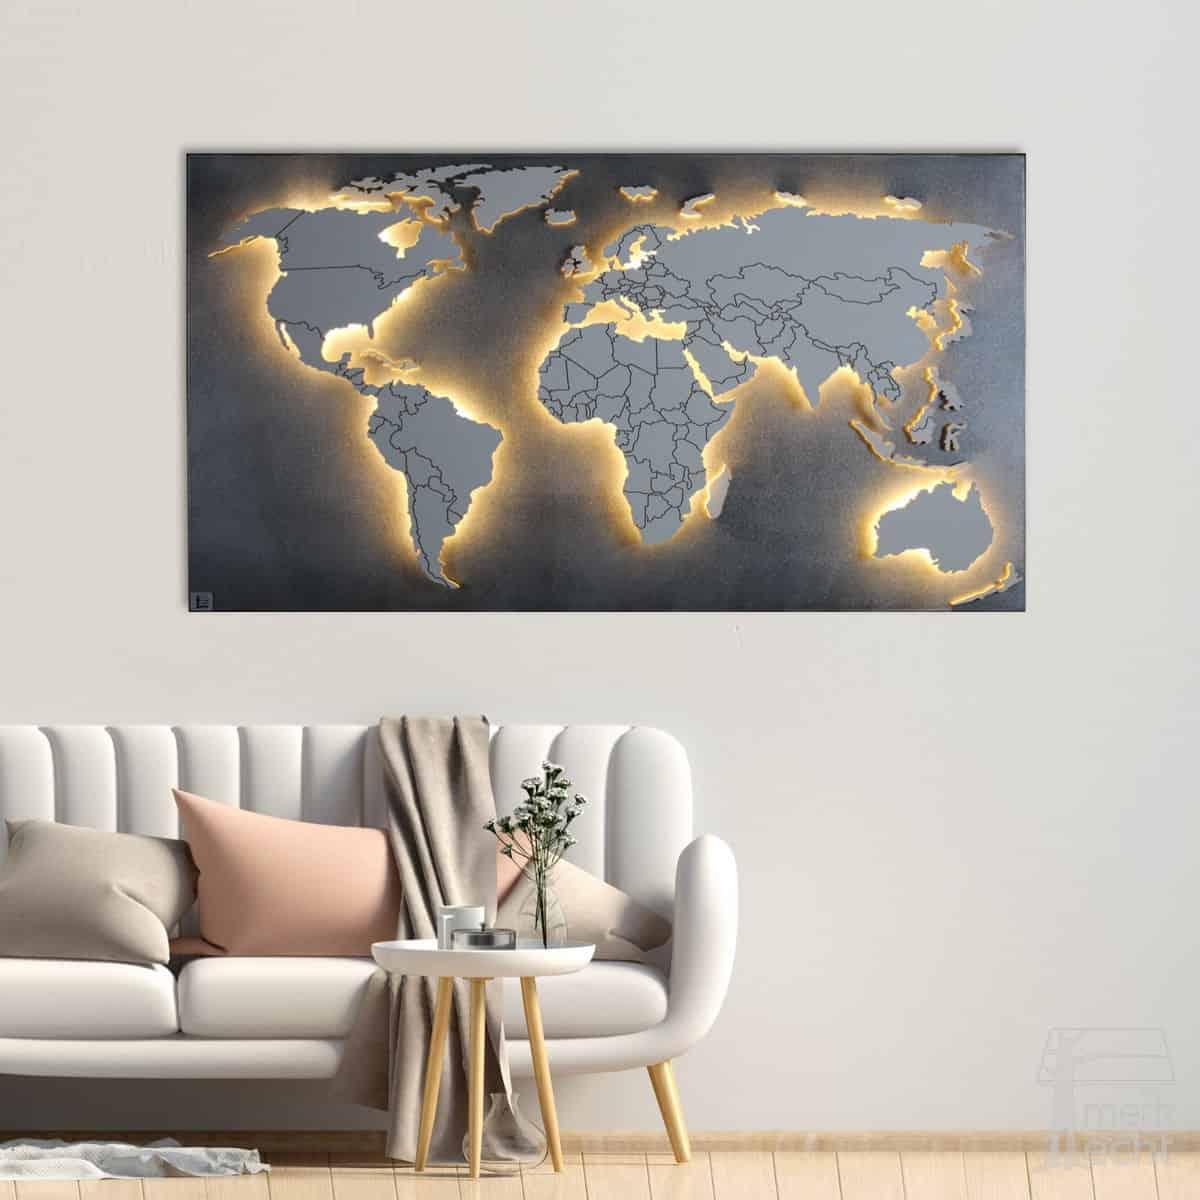 Weltkarte-Magnetisch-Magnetwand-Sonderanfertigung-Wandbild-Beleuchtet-WeißesKontinente-Holz-Welt-Karte-XXL-WelkartenAusHolz-WeißeKontinente-KontinenteHolz